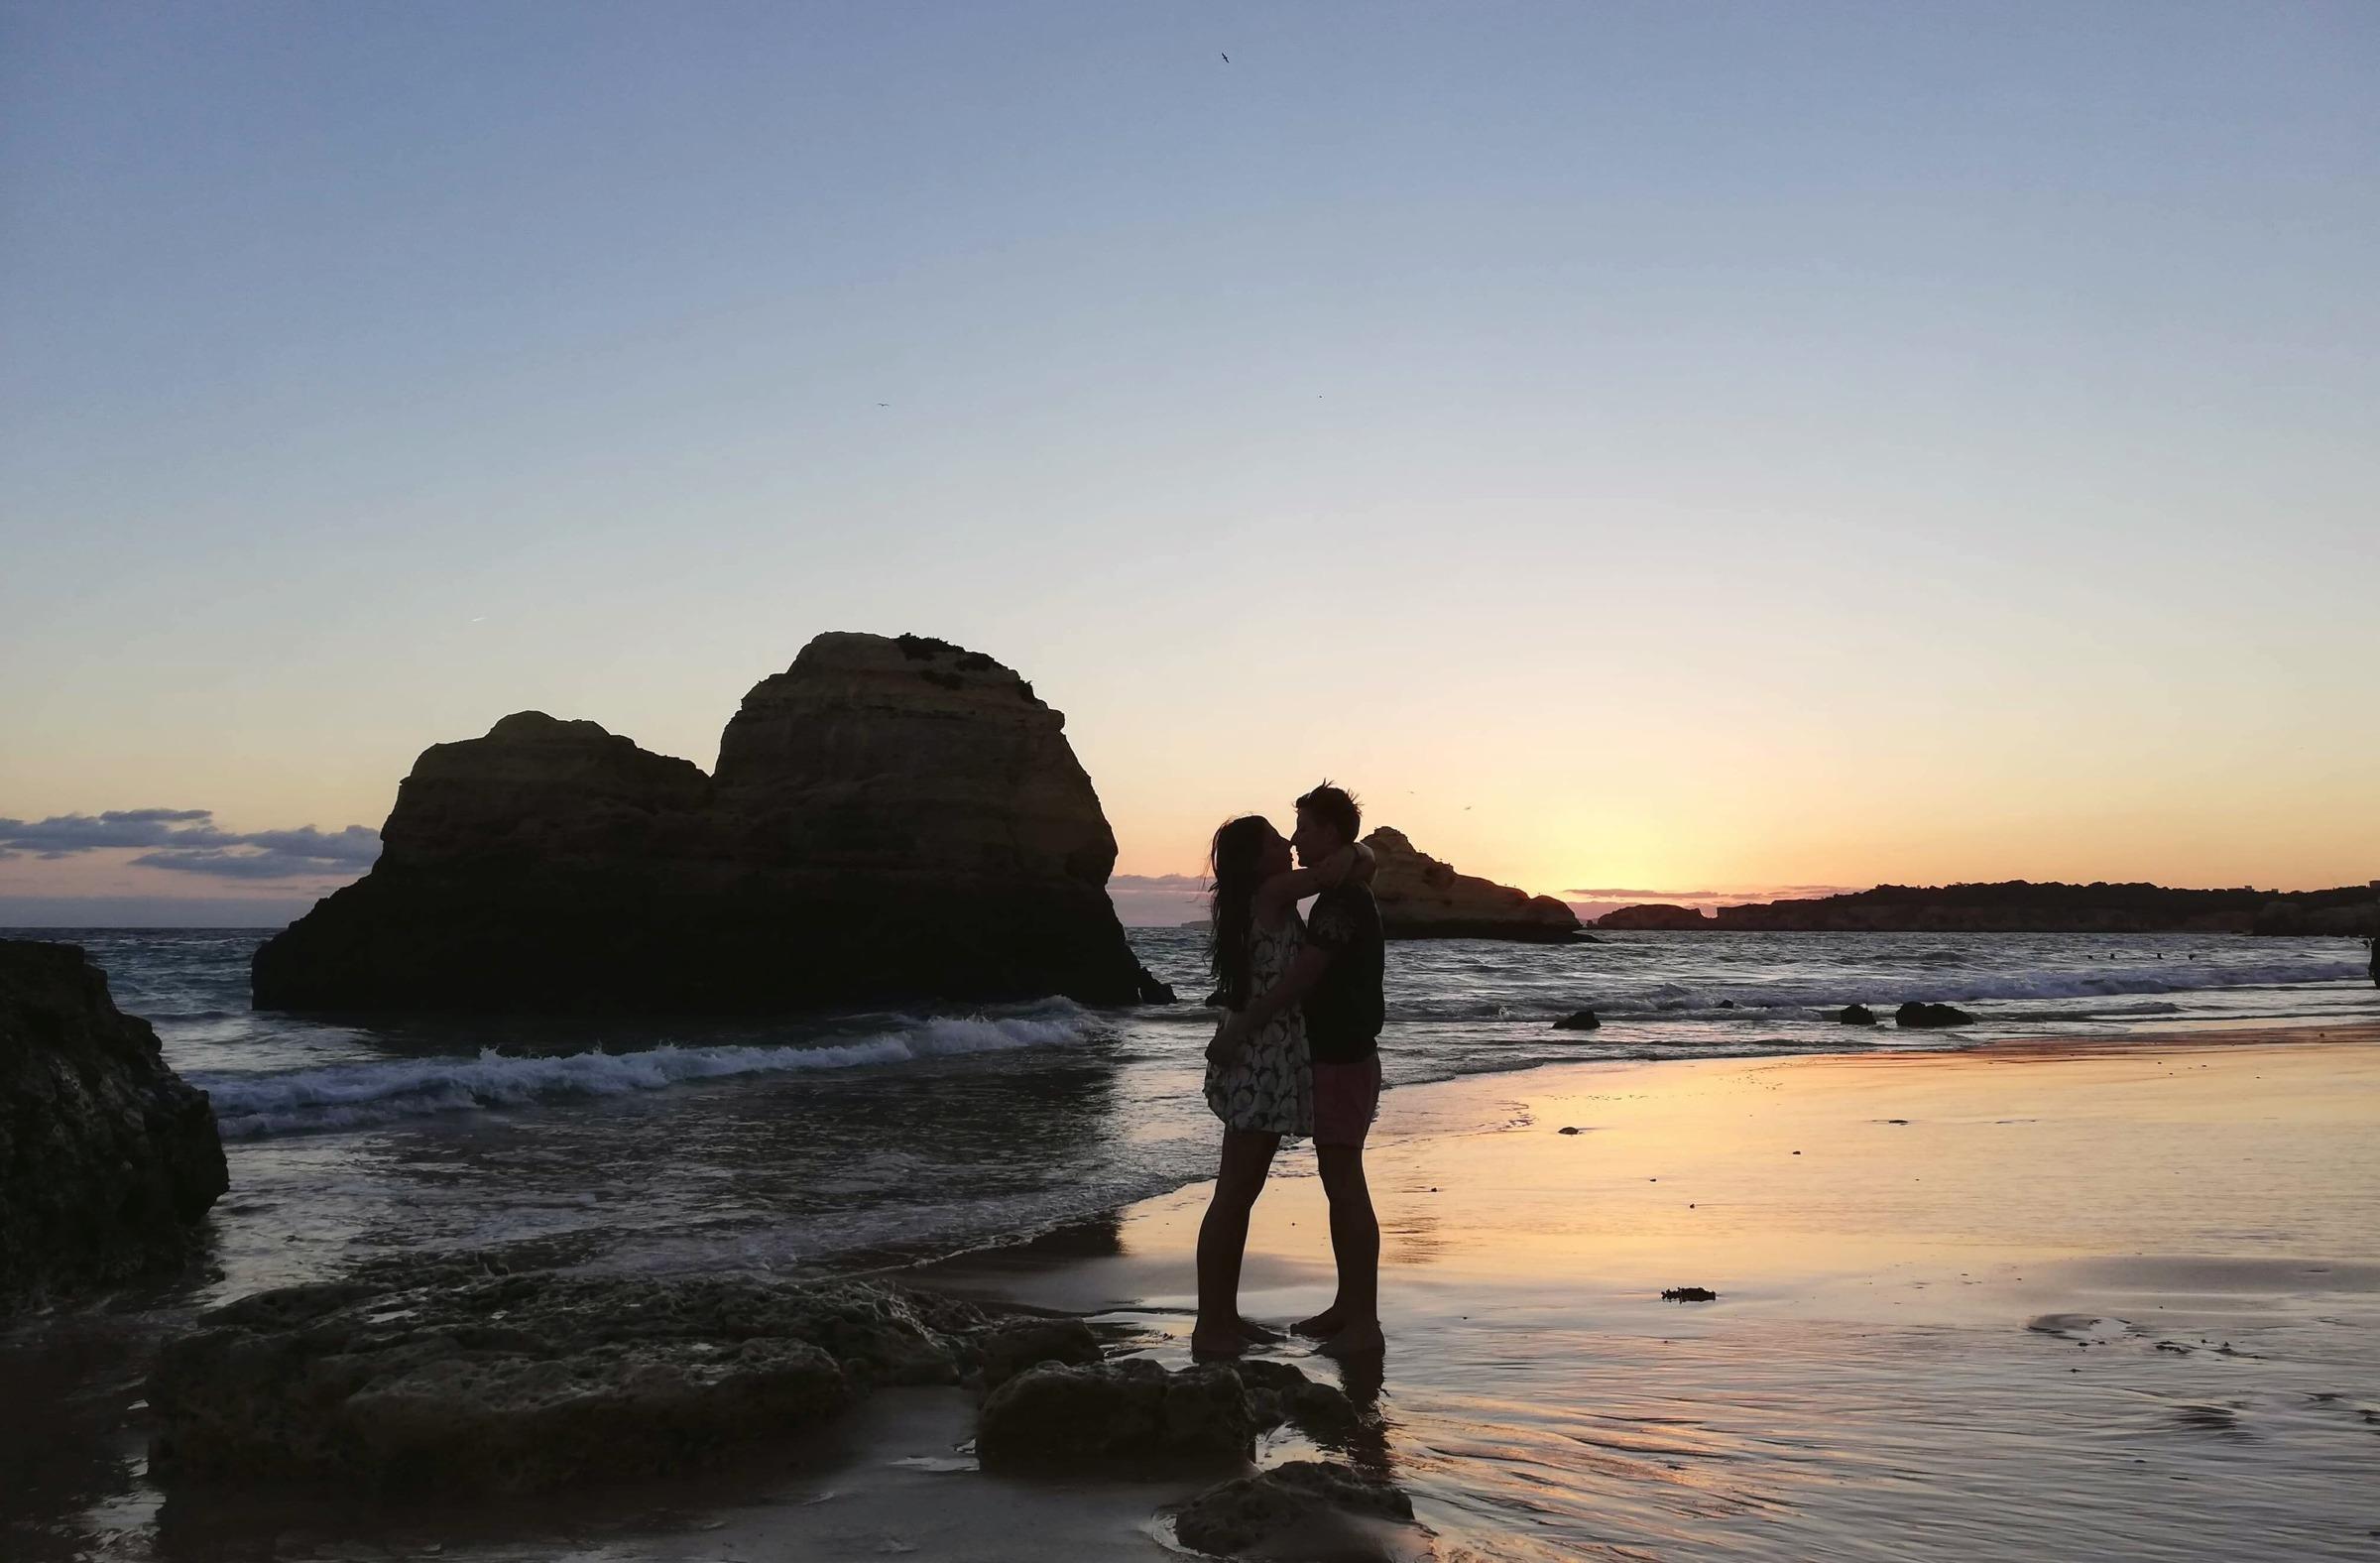 praia-da-rocha-algarve-portugalia-zach%C